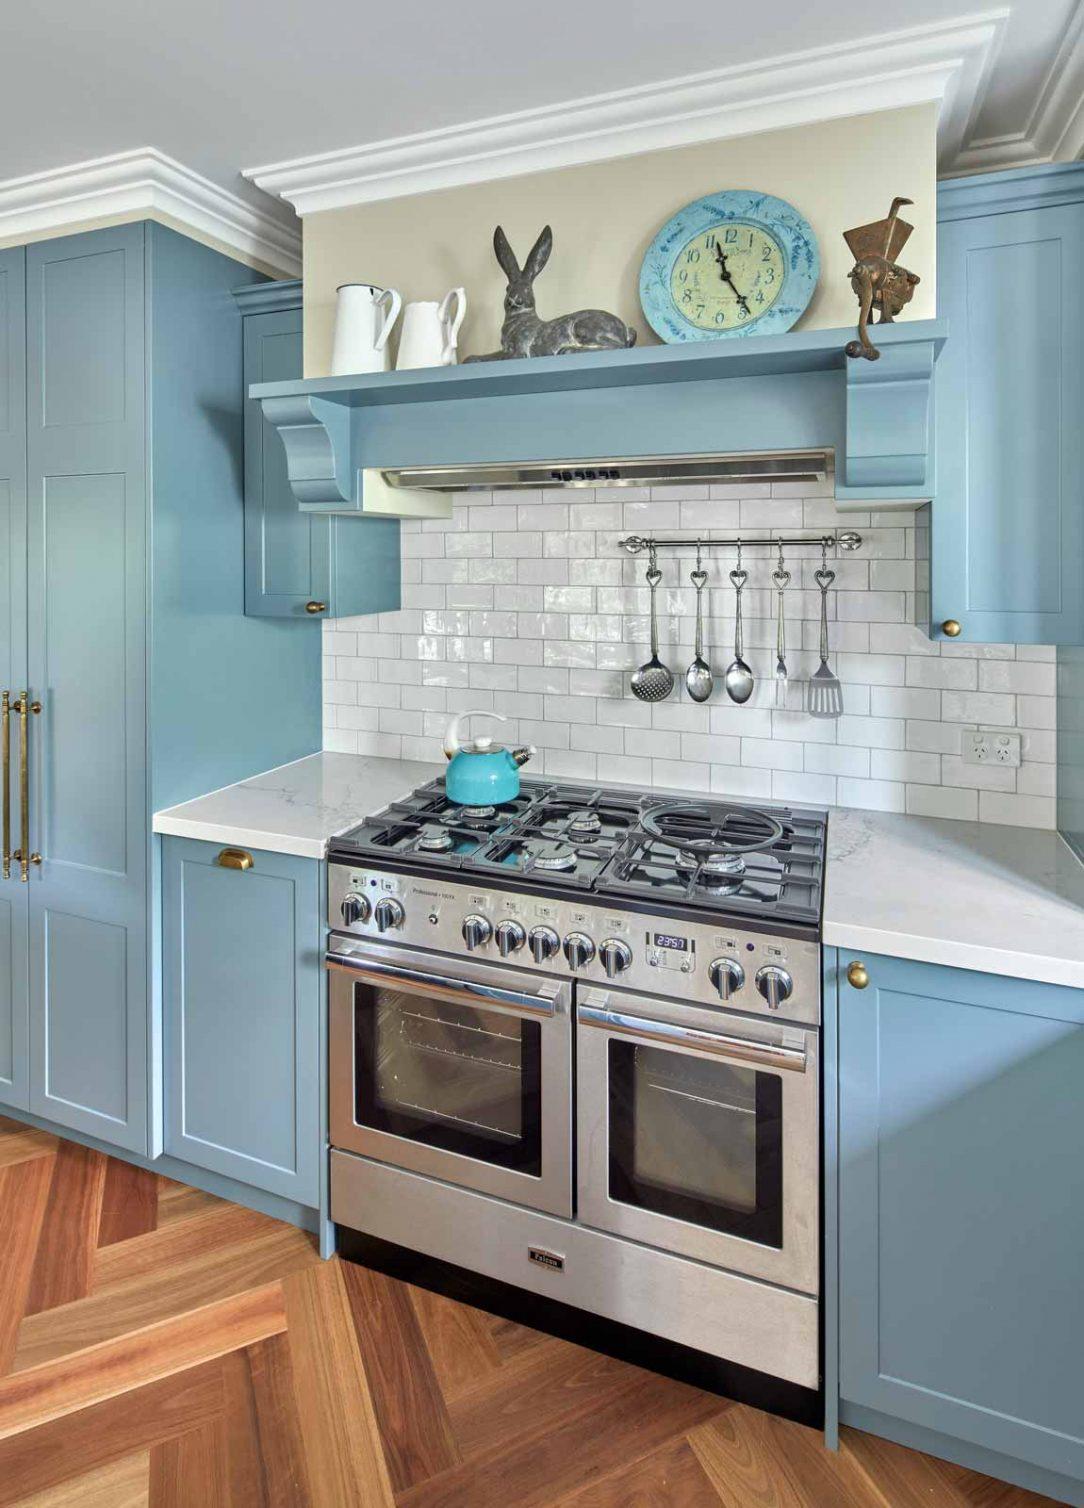 classic kitchen design traditional shaker doors light blue statuario benchtop premier kitchens australia